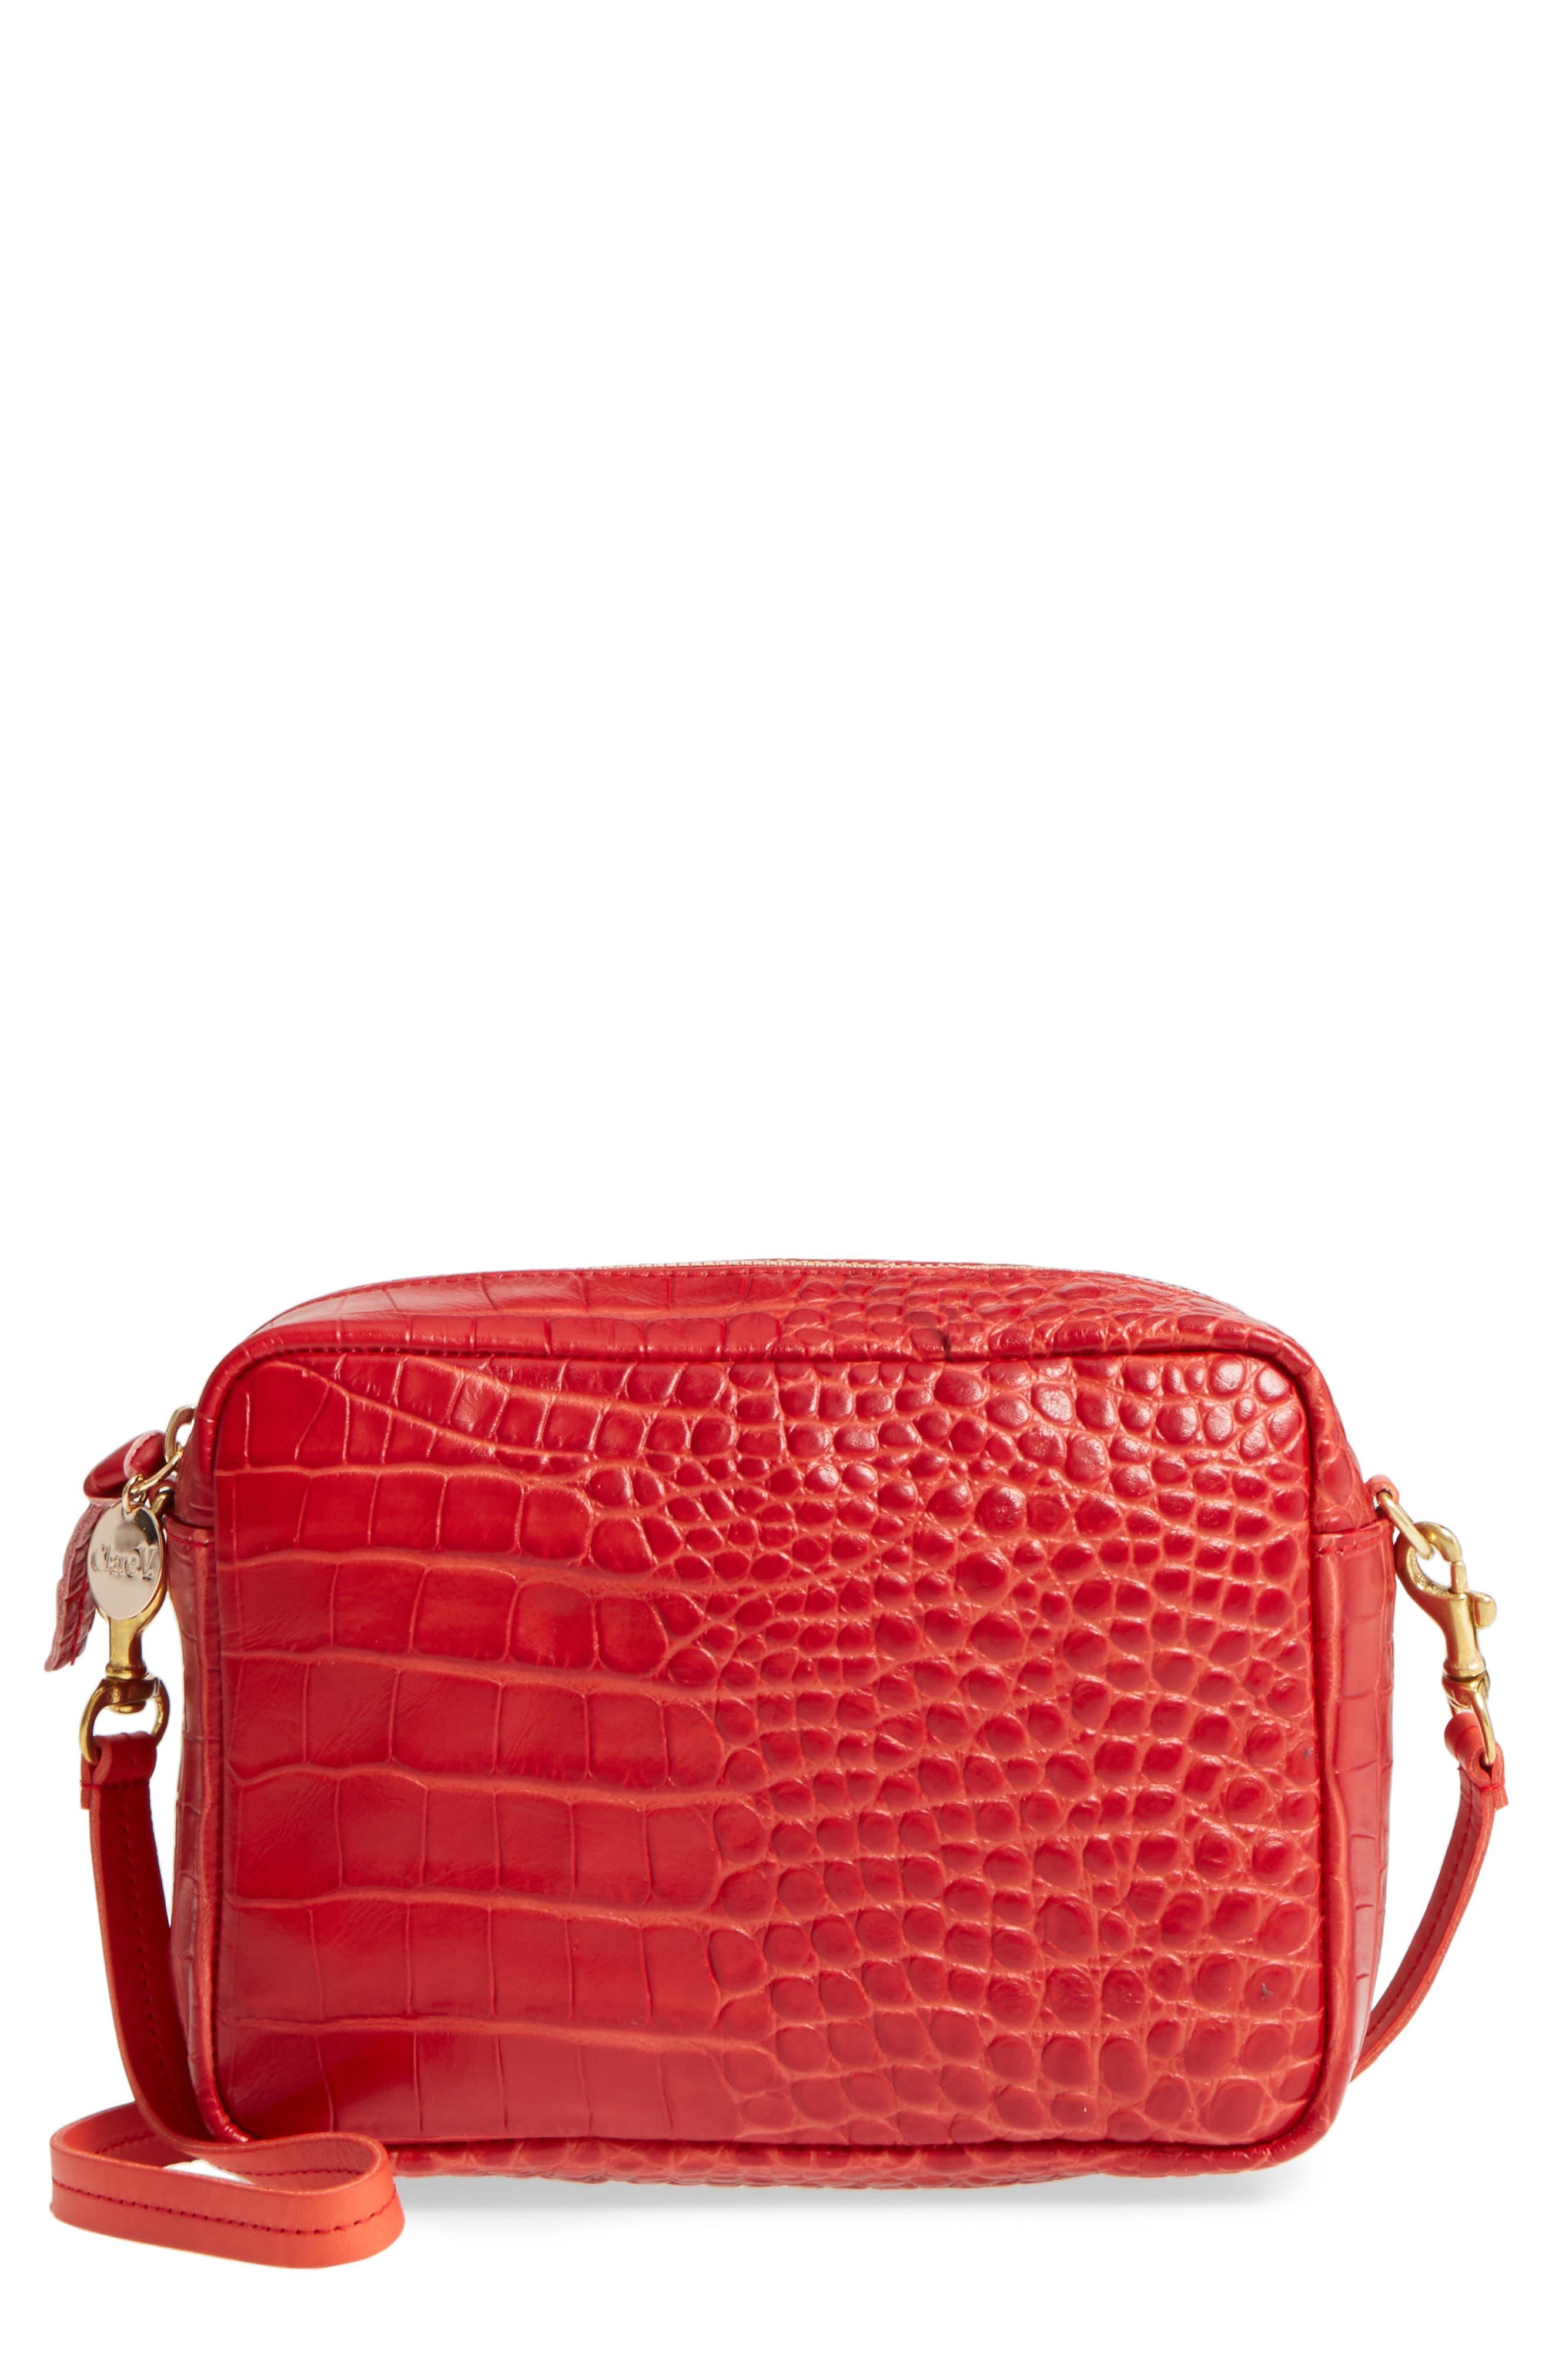 Midi Sac Supreme Croc Embossed Leather Crossbody Bag,                         Main,                         color, 600